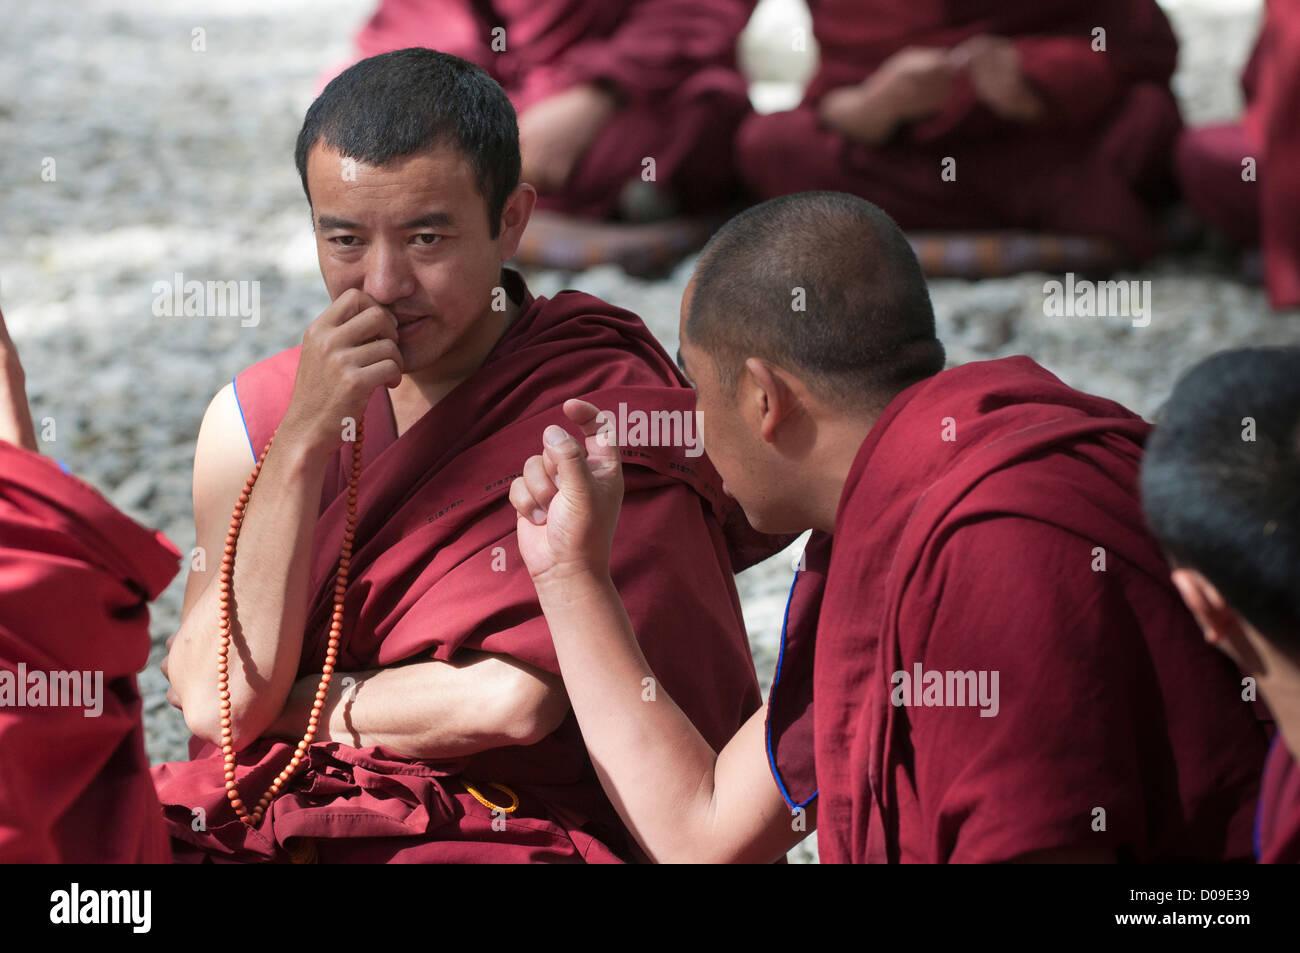 Buddhist monk makes point during debate as partner considers, Drepung Monastery, Lhasa, Tibet, China - Stock Image